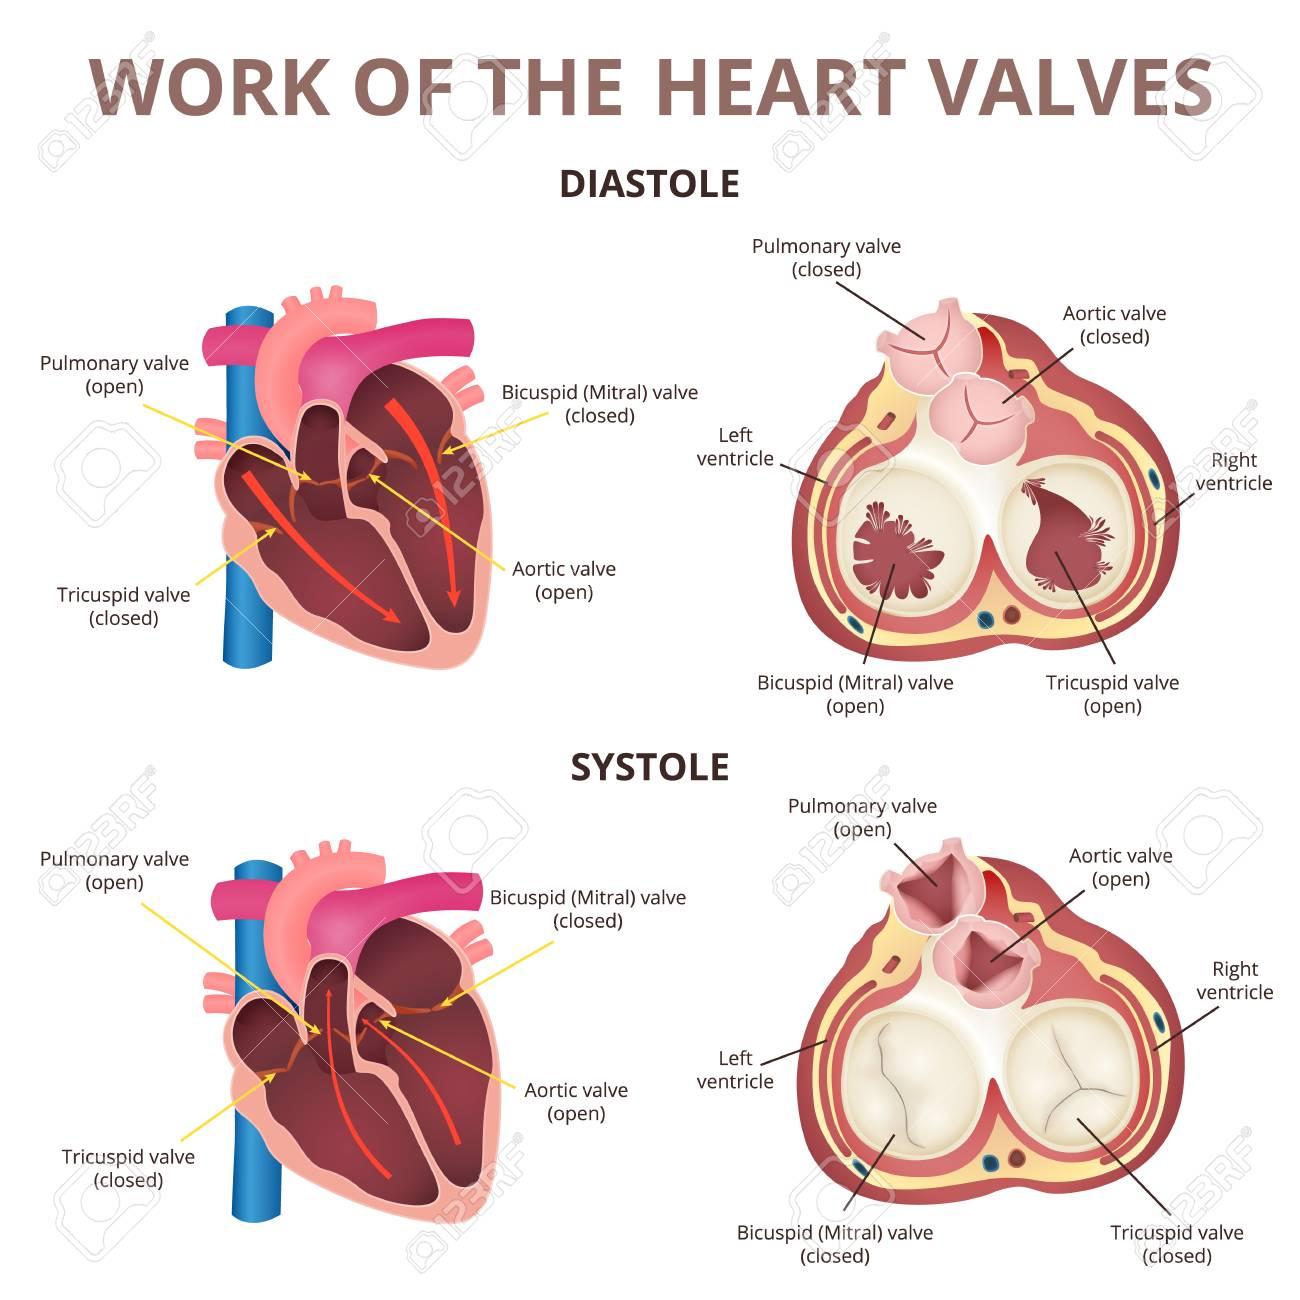 anatomy of the human heart - 97141289